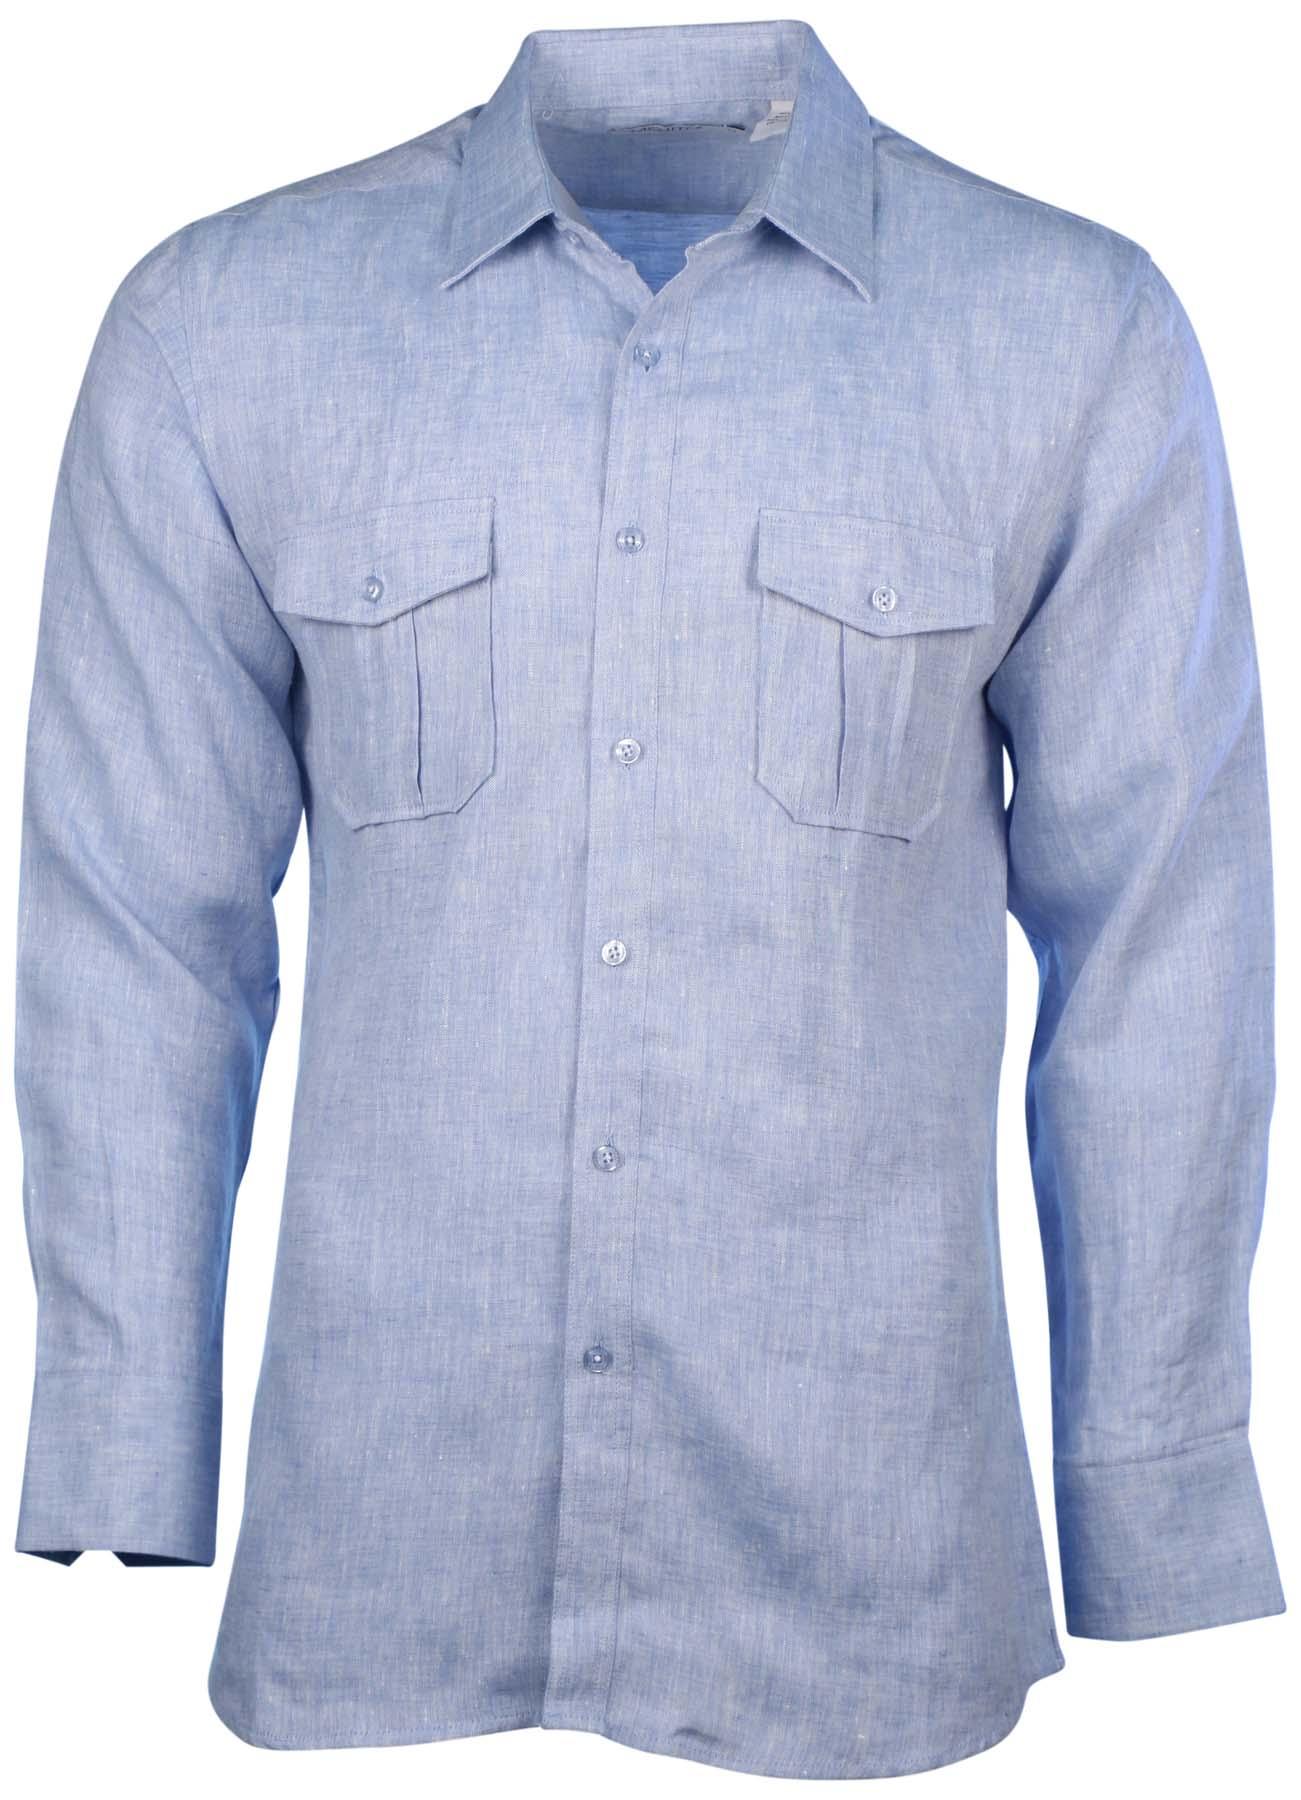 Mojito collection men 39 s linen 2 pocket long sleeve button for Linen long sleeve shirt